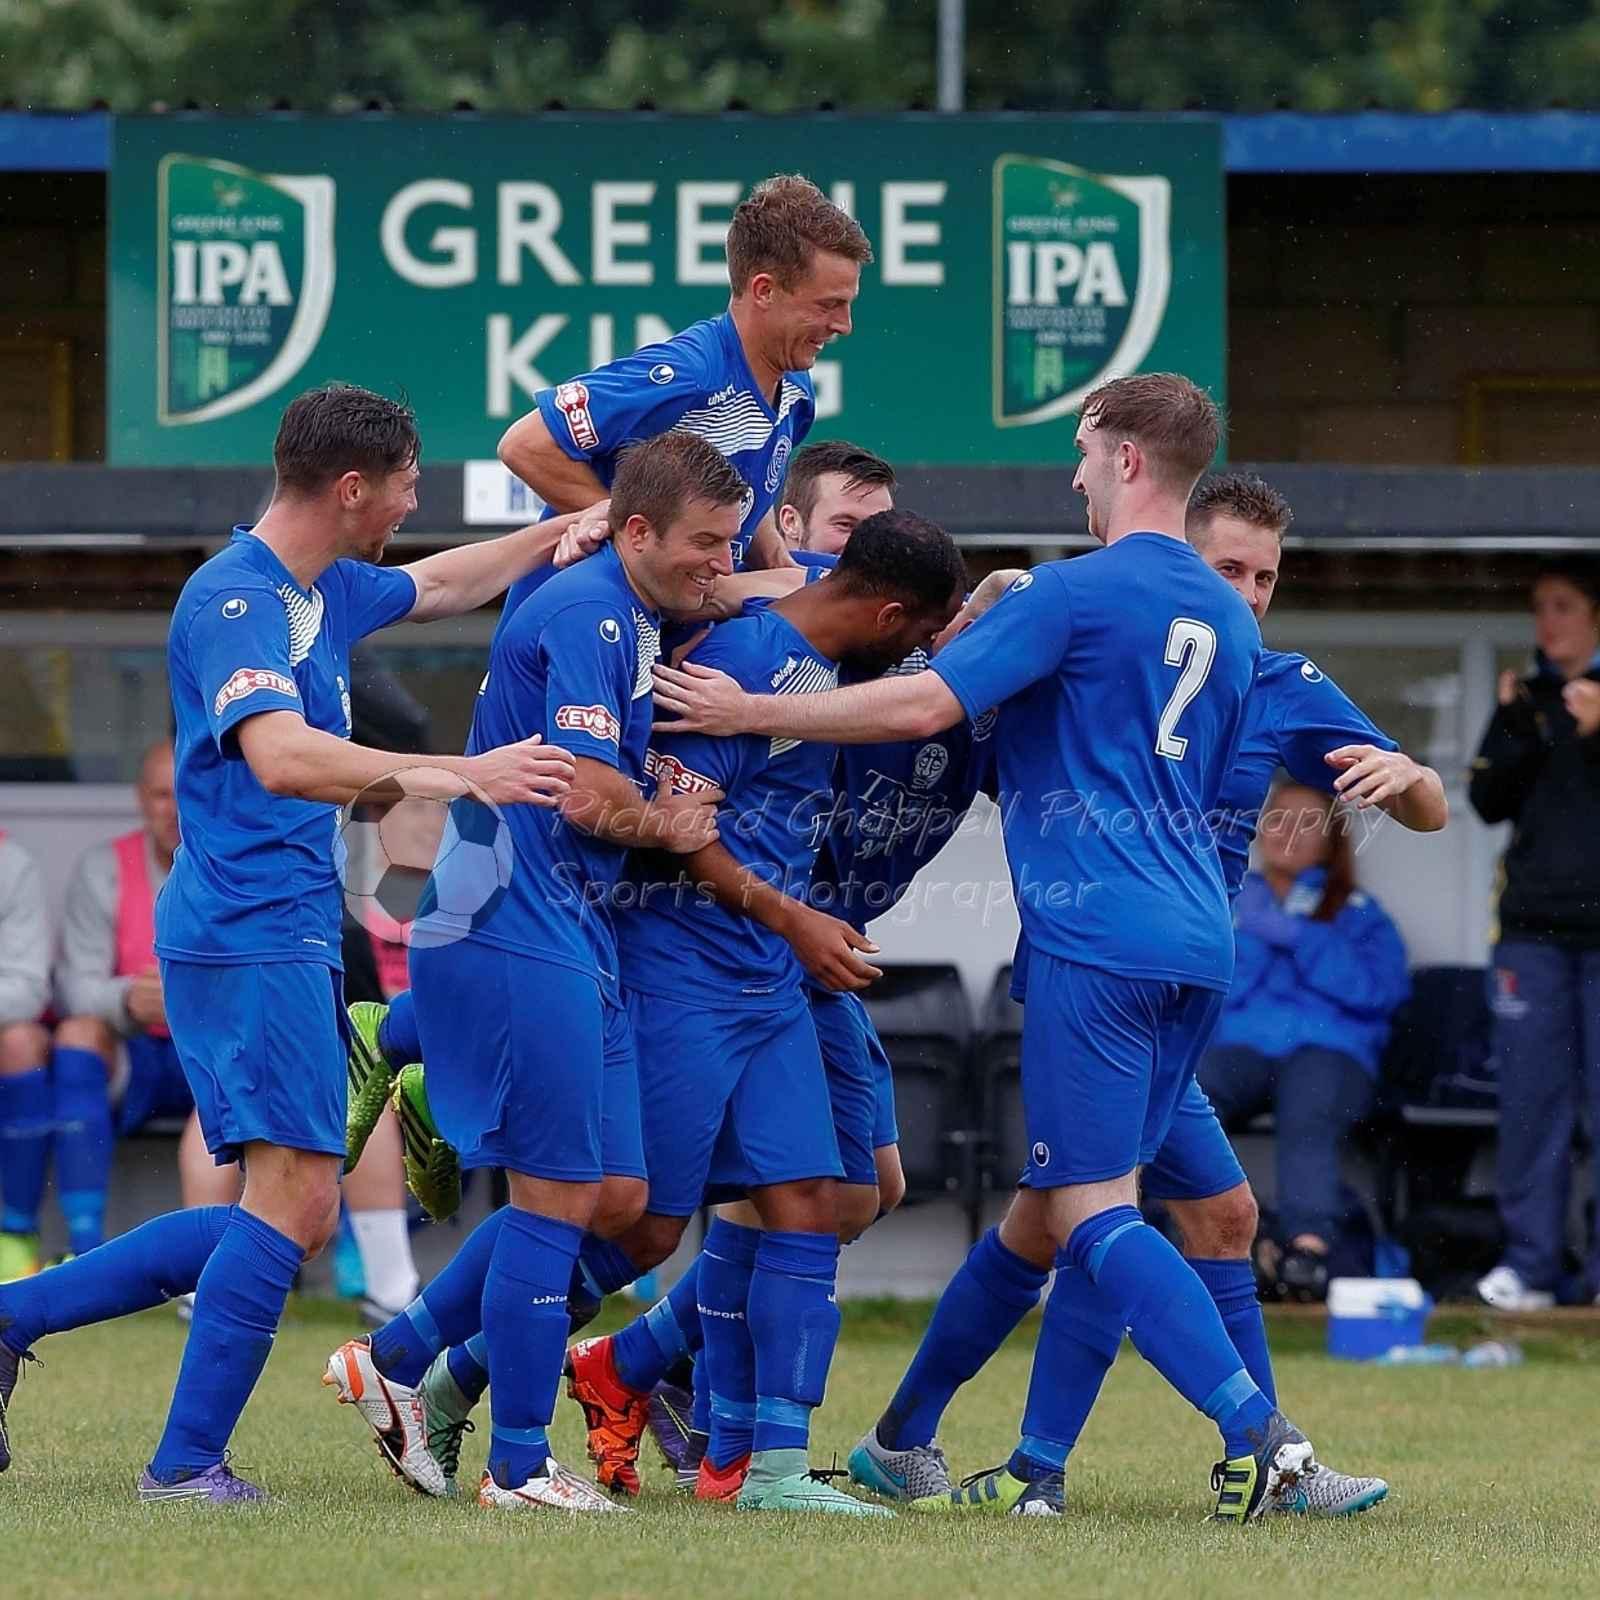 Chippenham vs Leamington |  Match Highlights